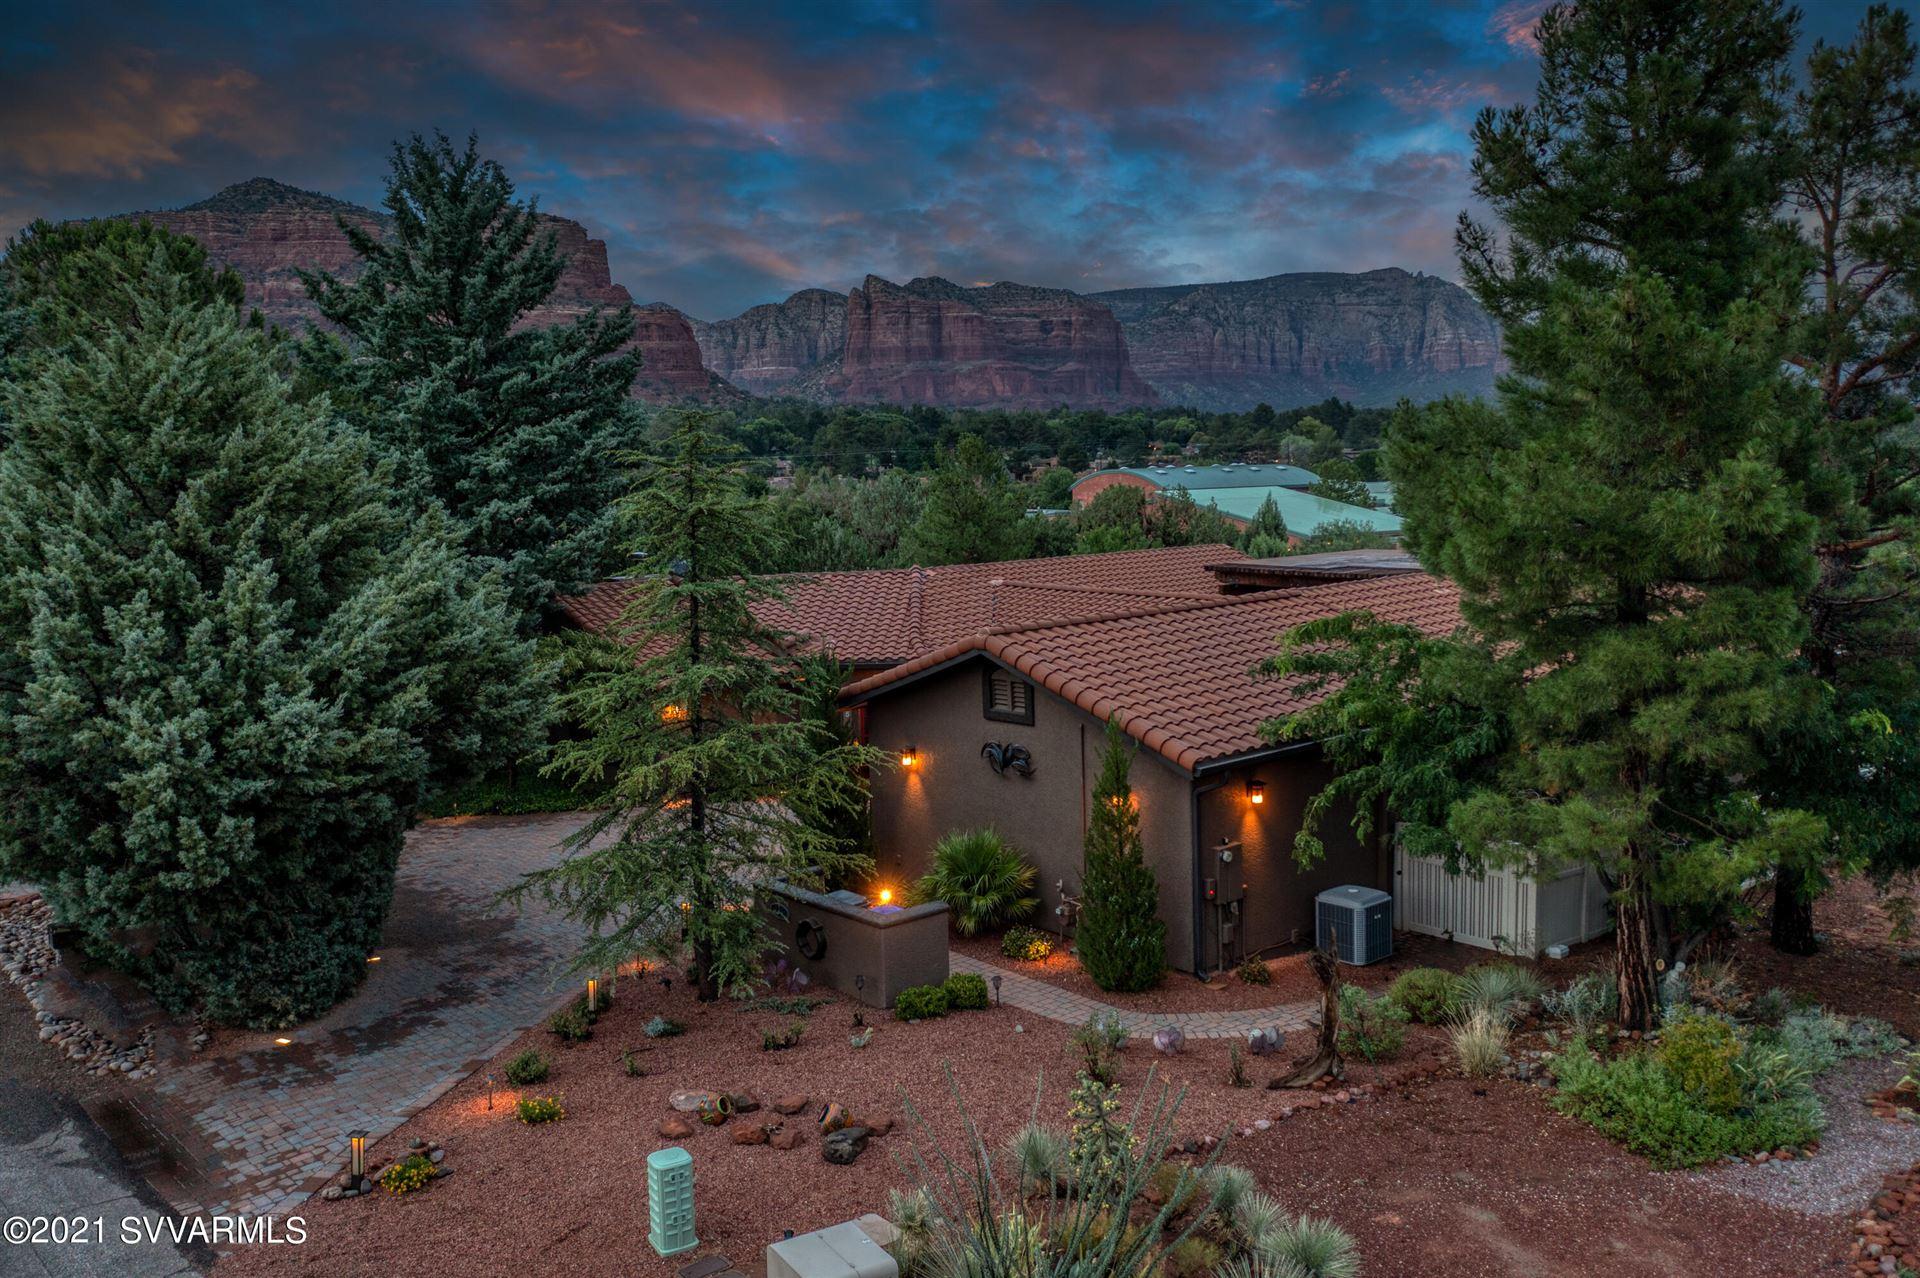 Photo of 185 Deer Pass Drive, Sedona, AZ 86351 (MLS # 527177)